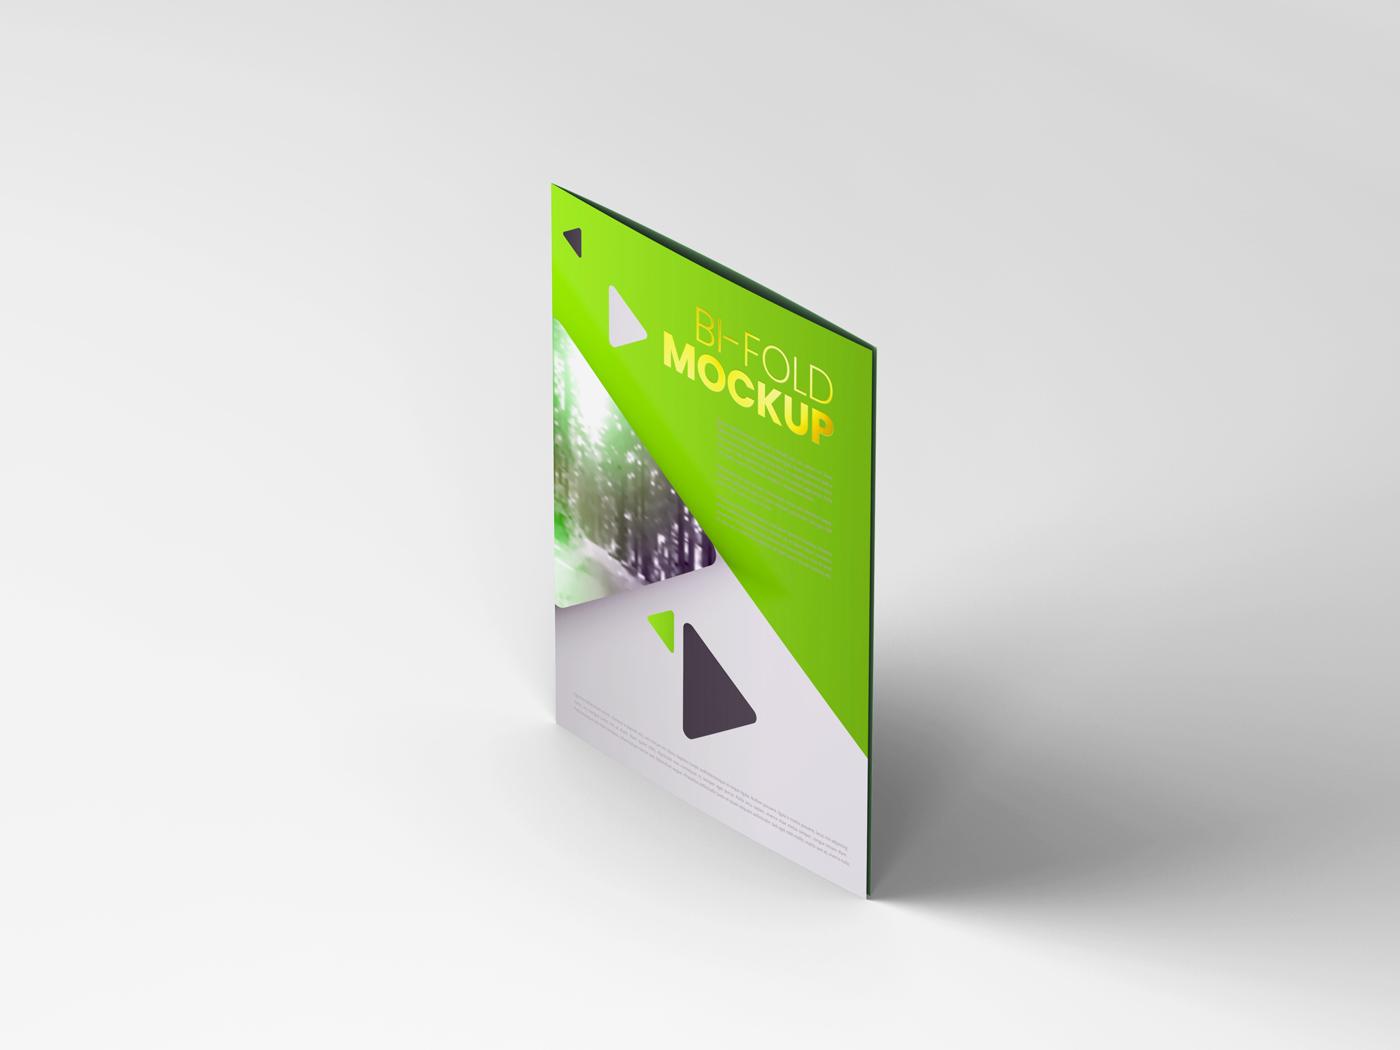 A4 Bifold Mockups V3 example image 8